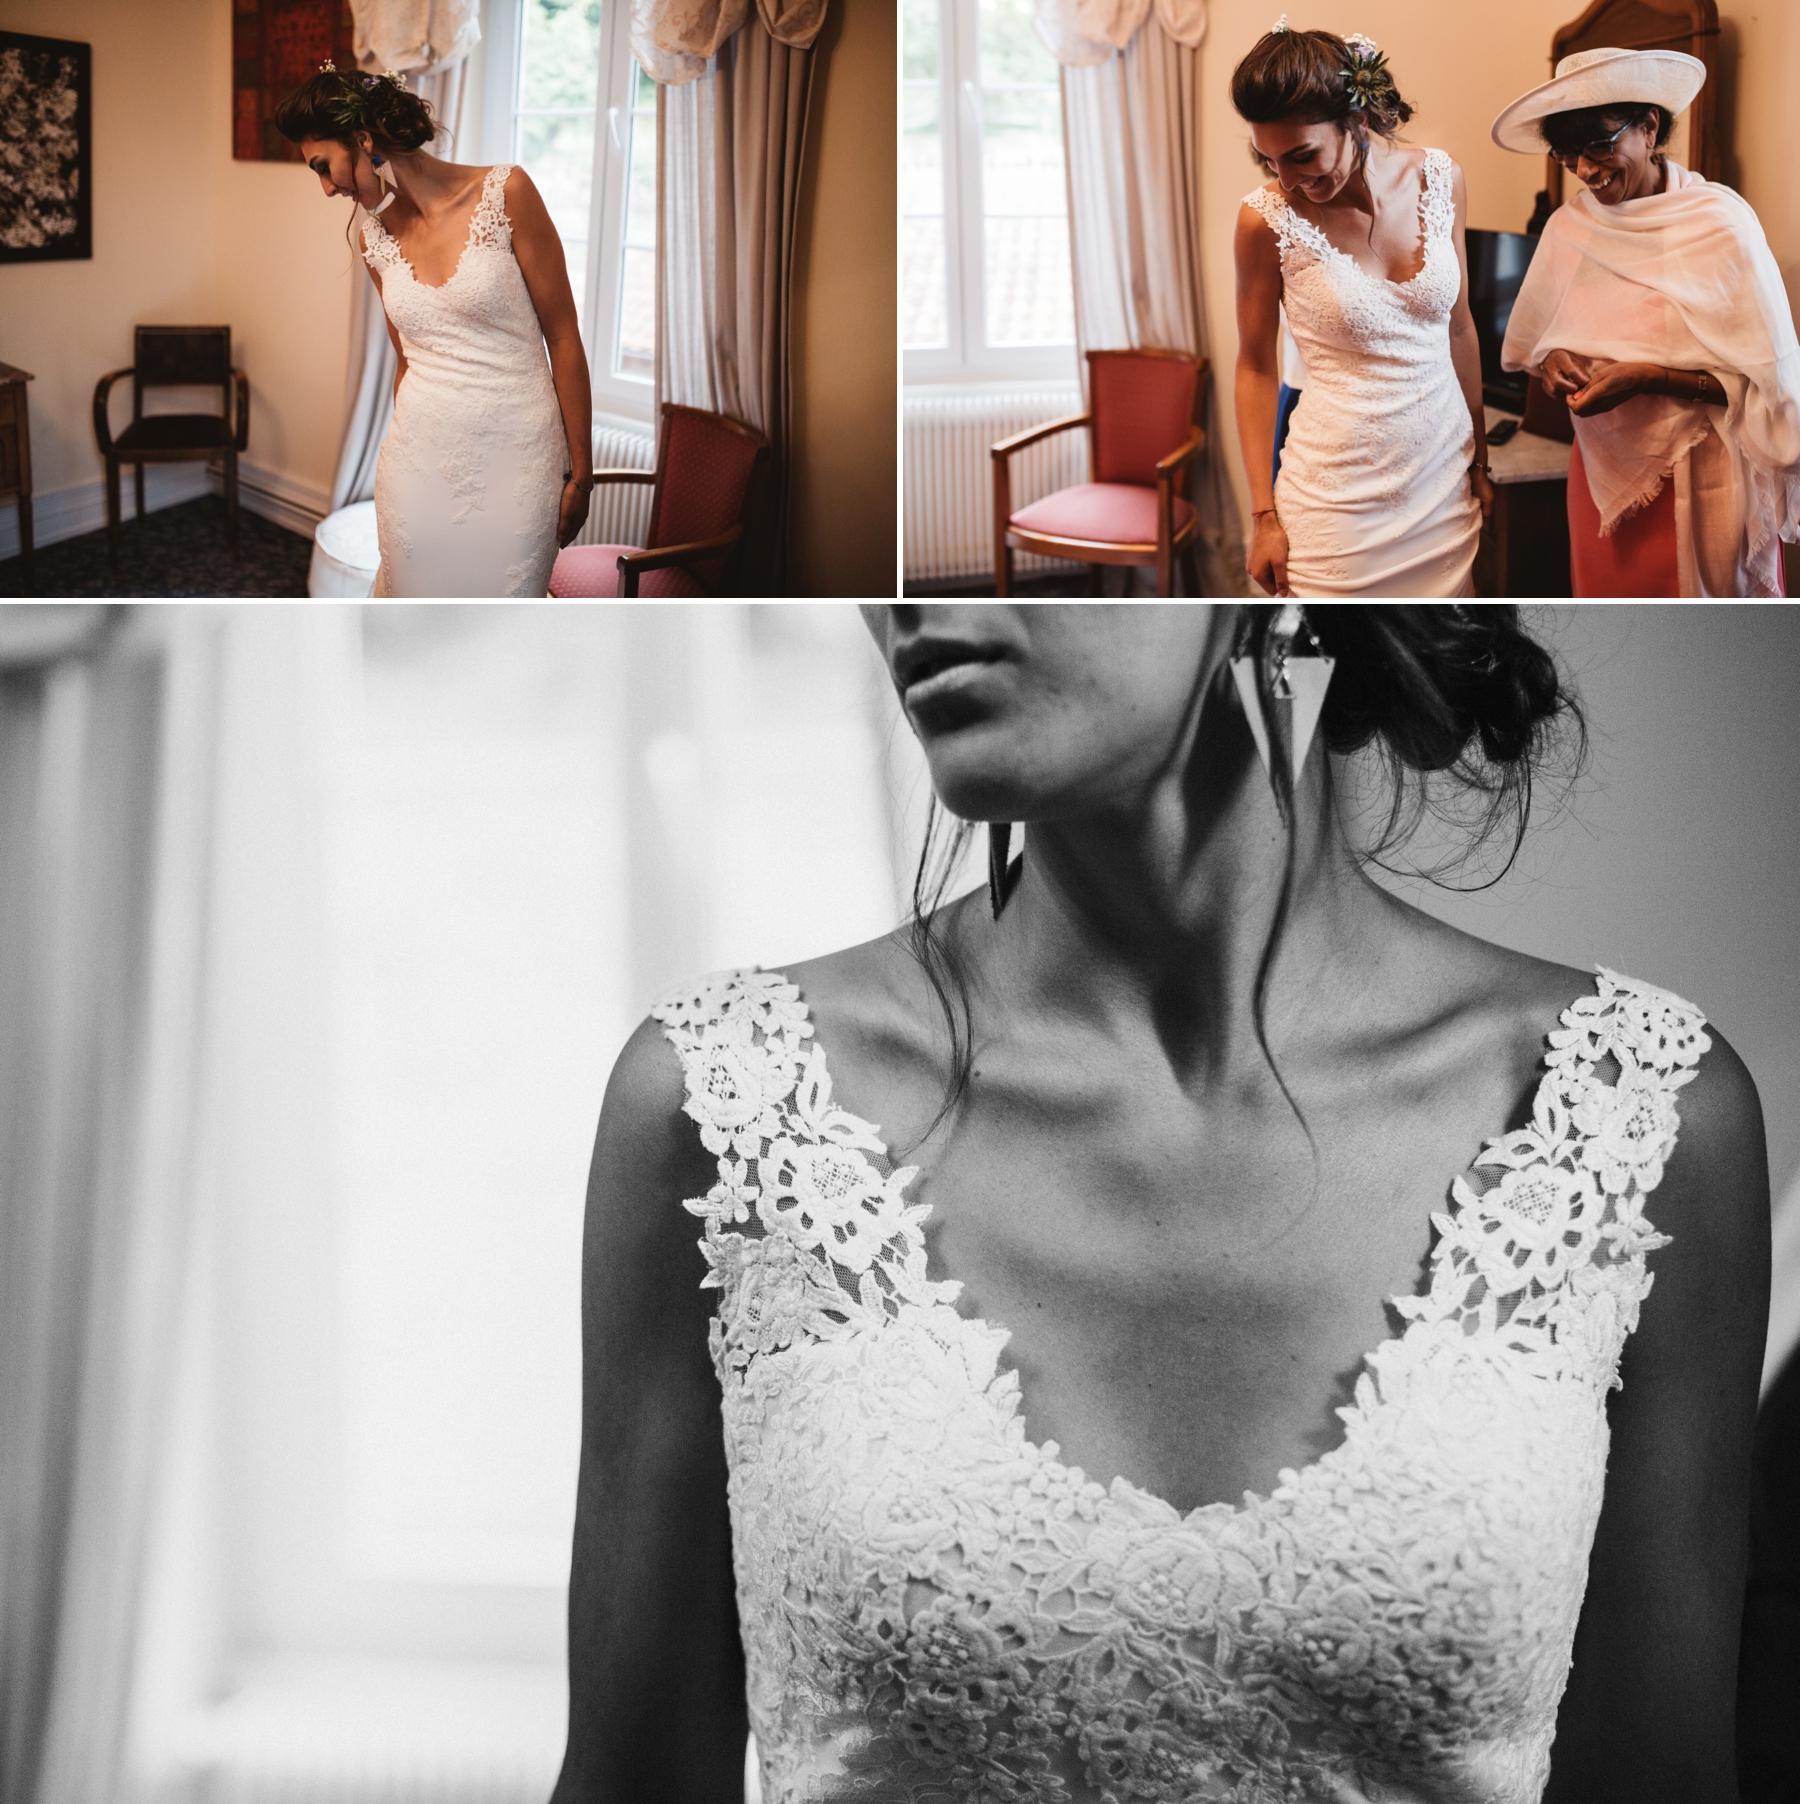 mariage-relais-gensbourg-raphaelmelka-23.jpg